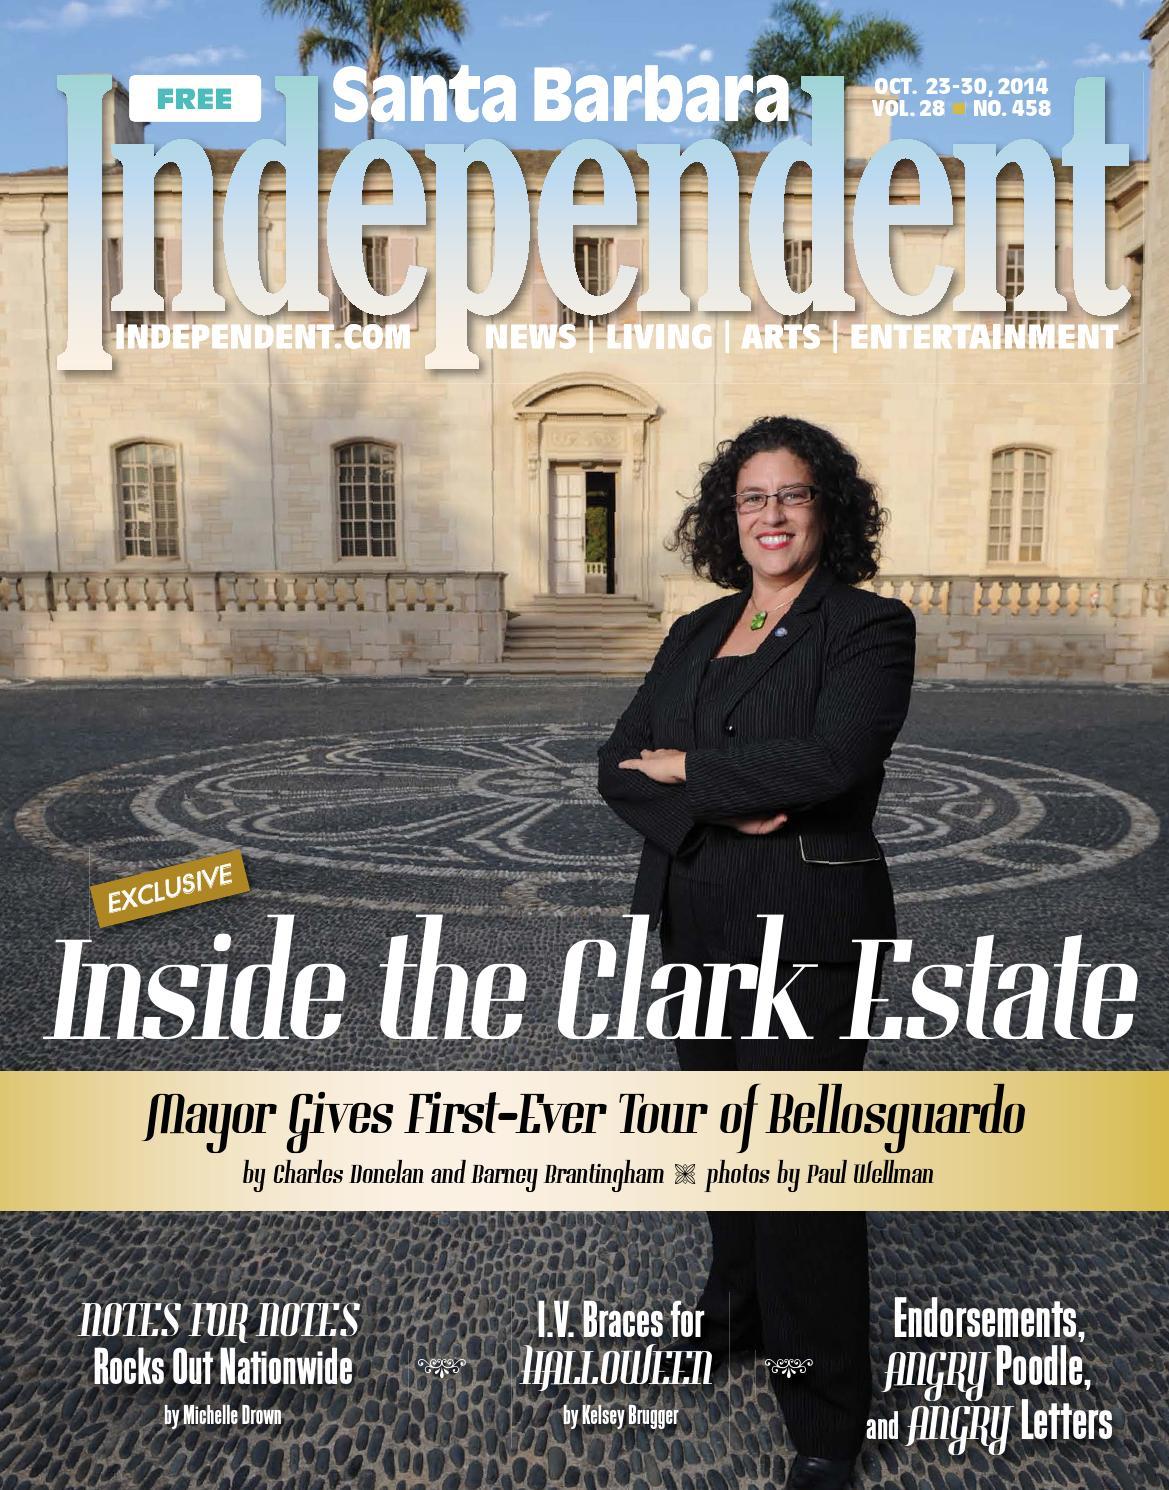 Santa Barbara Independent 10 23 14 By SB Independent Issuu